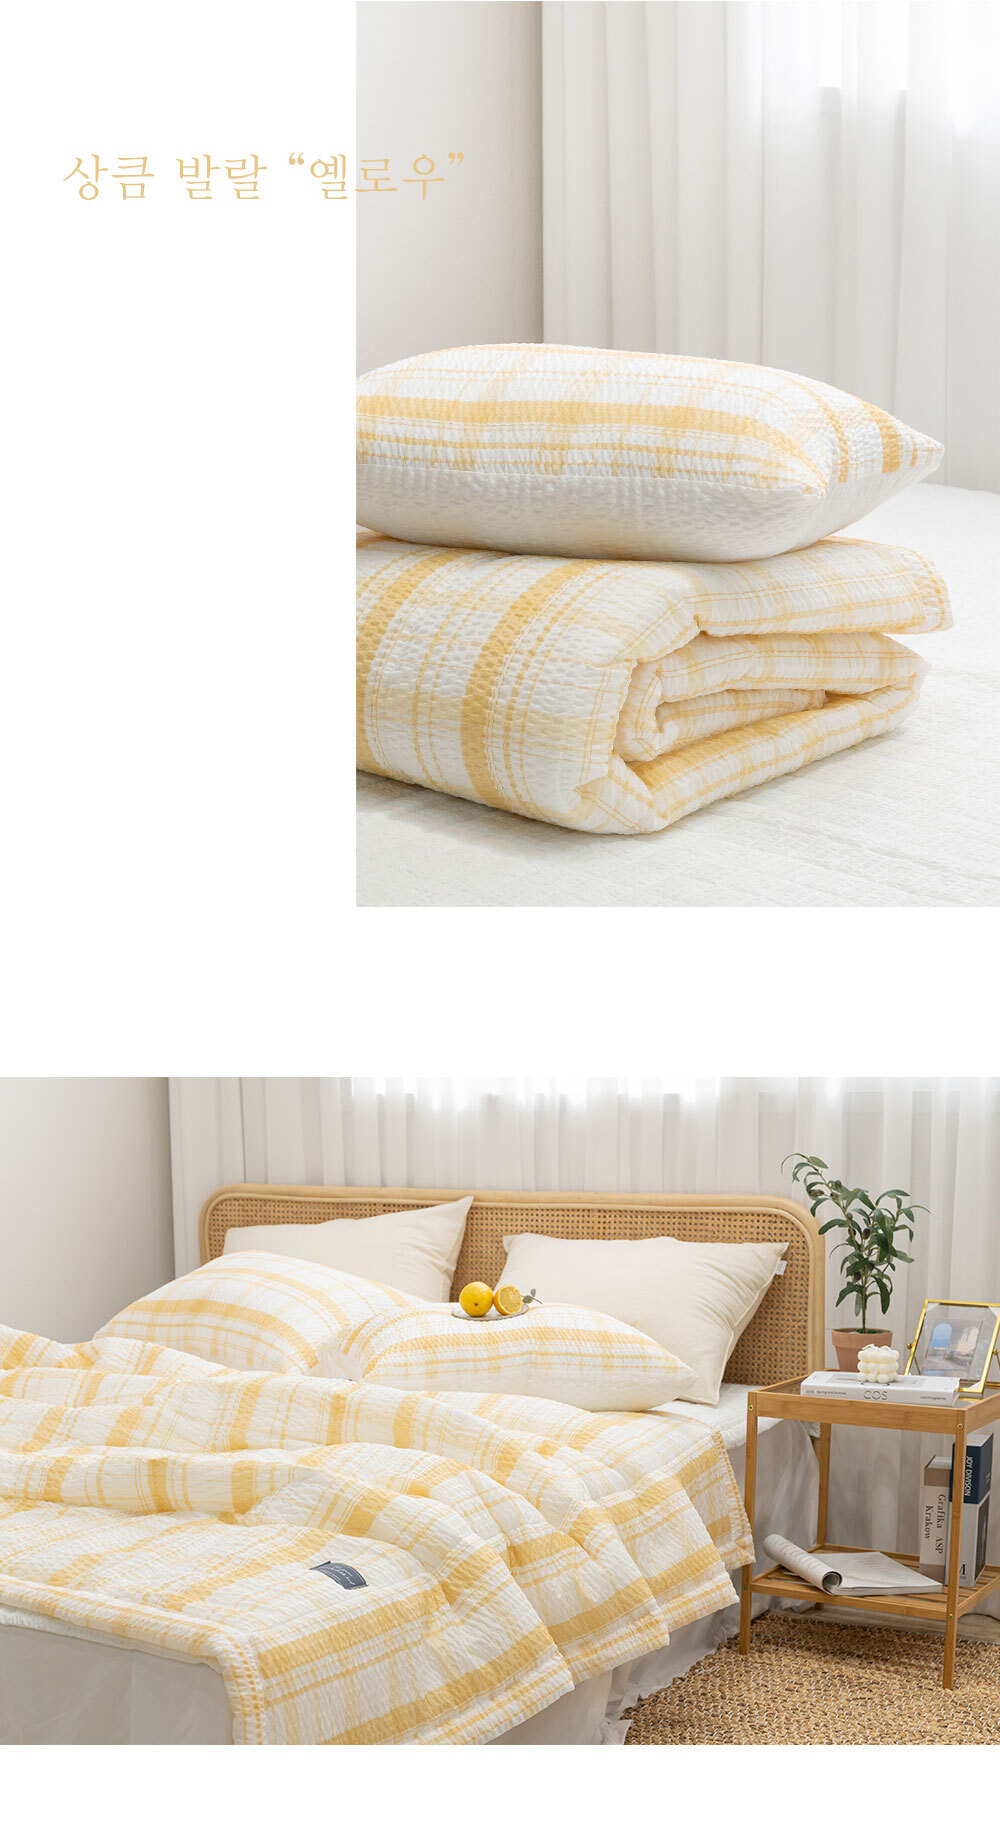 butterring_bed_yellow_01.jpg